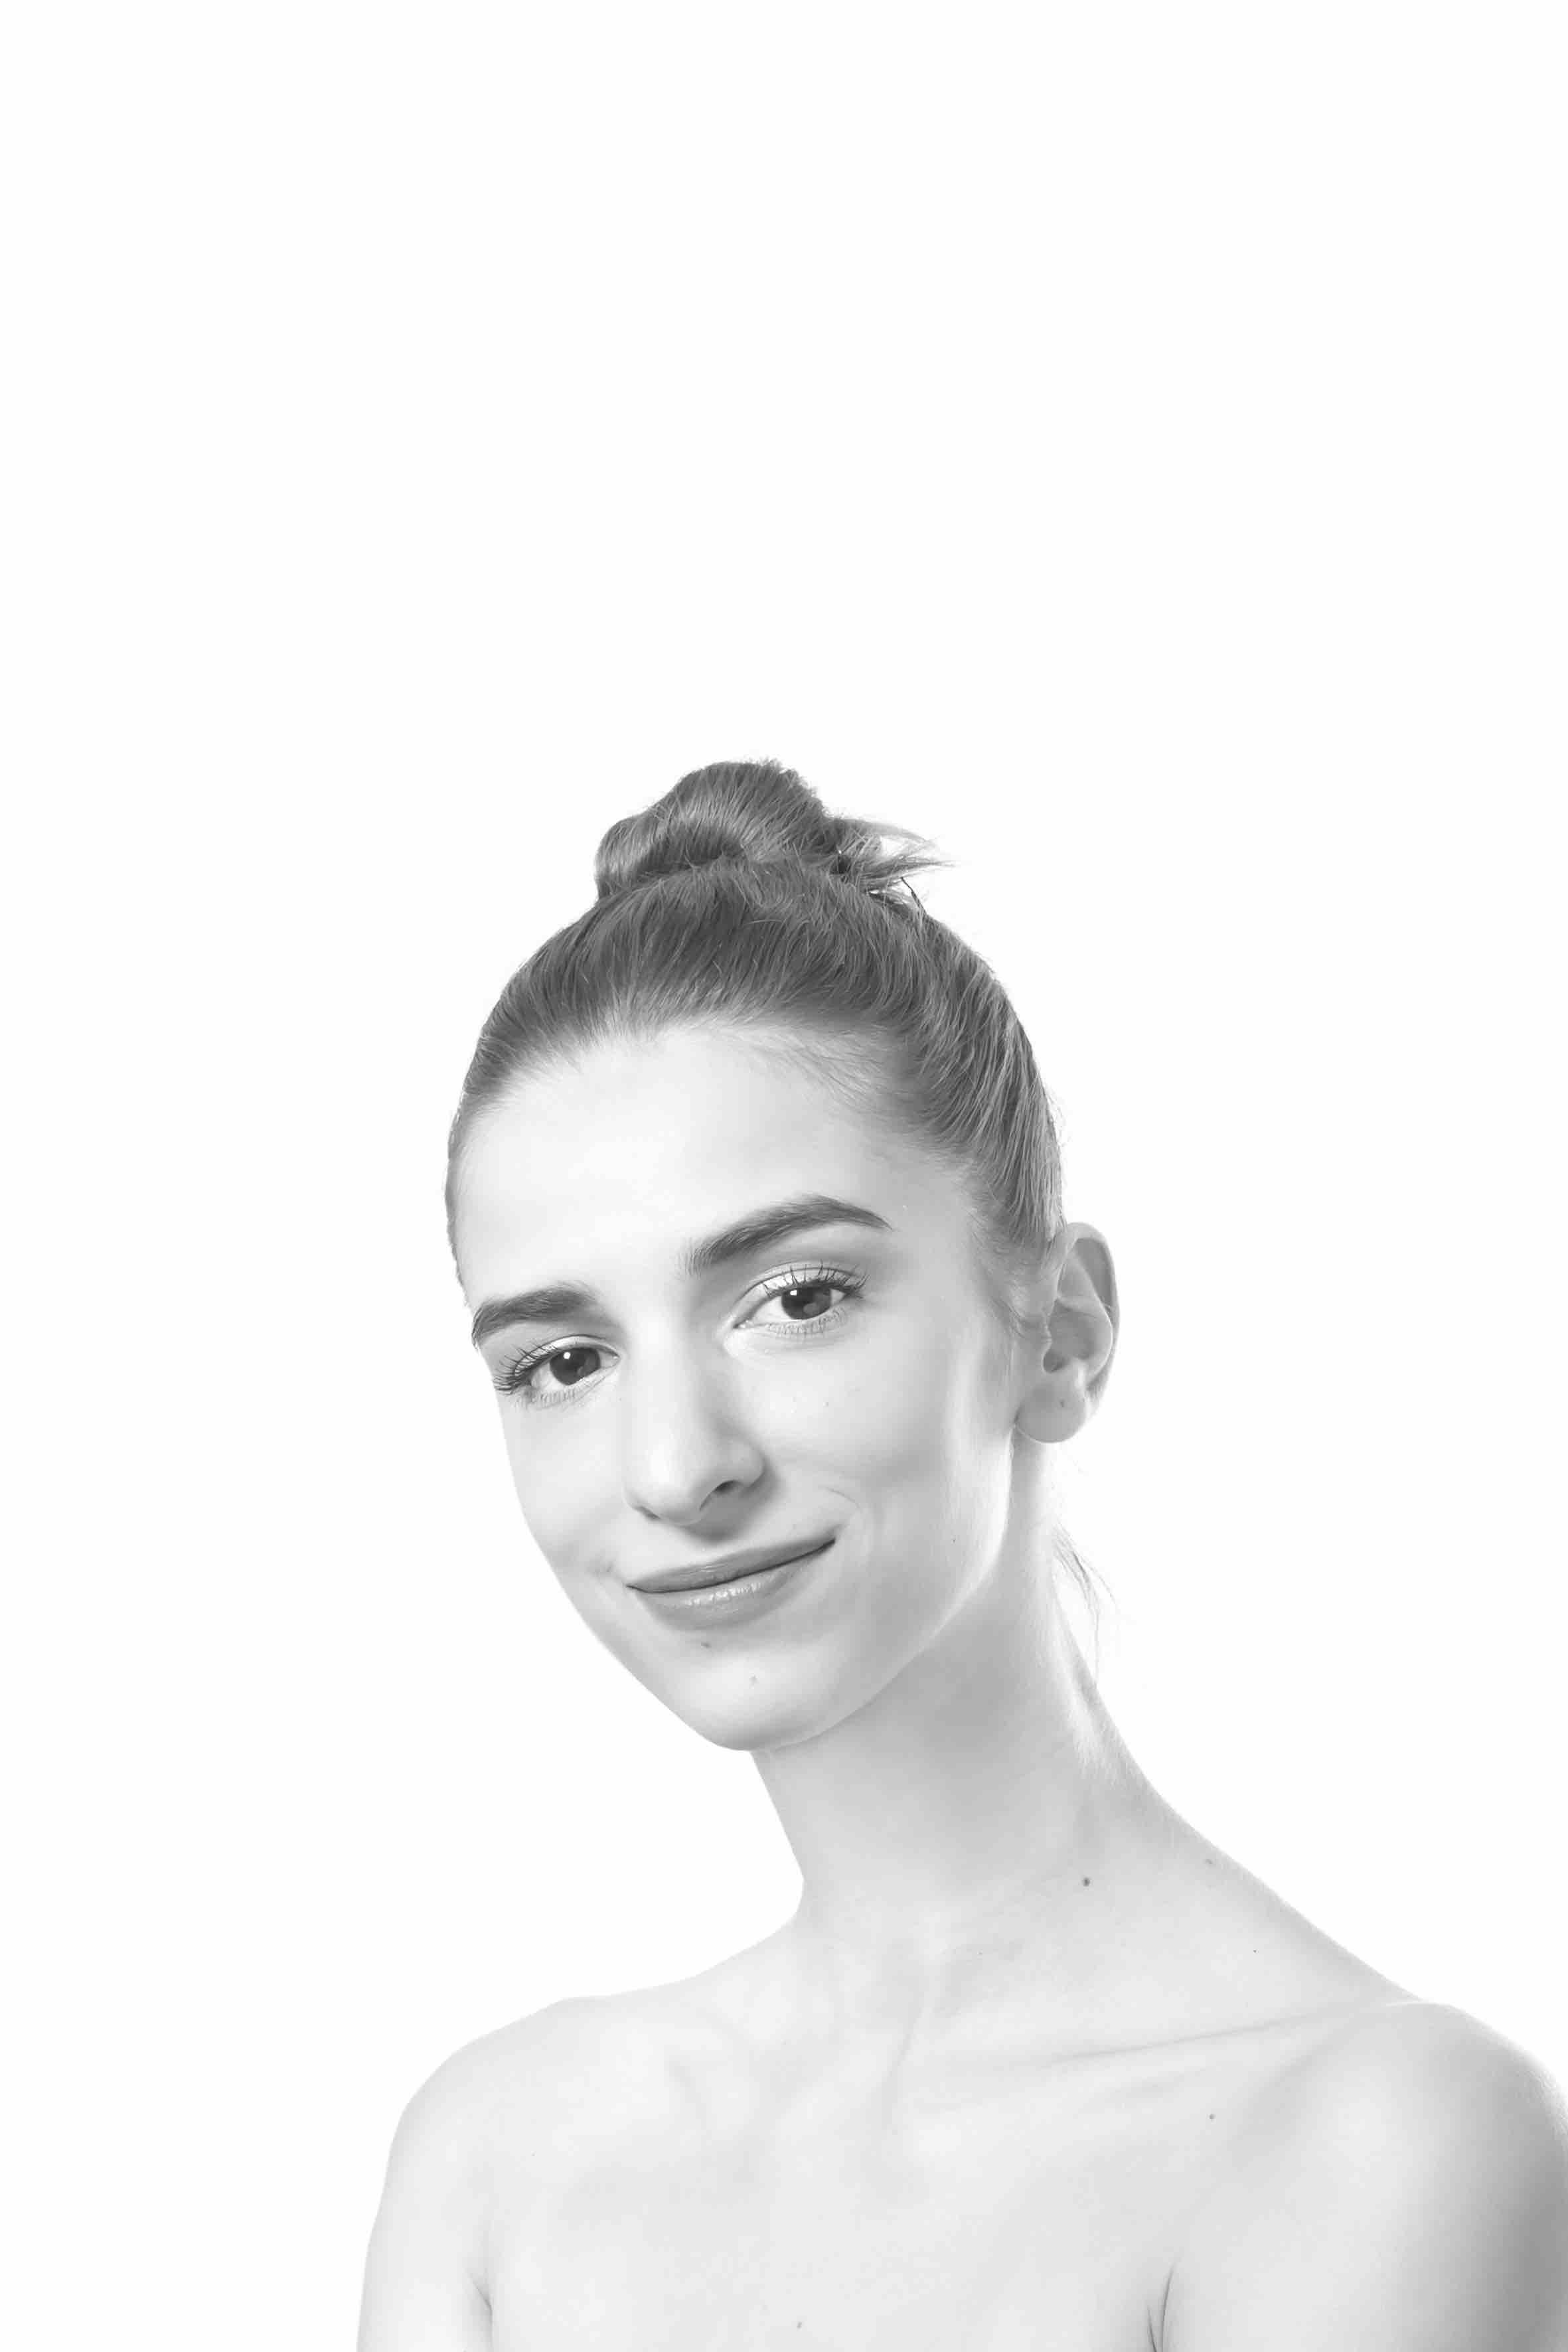 Ana Maria Gergely